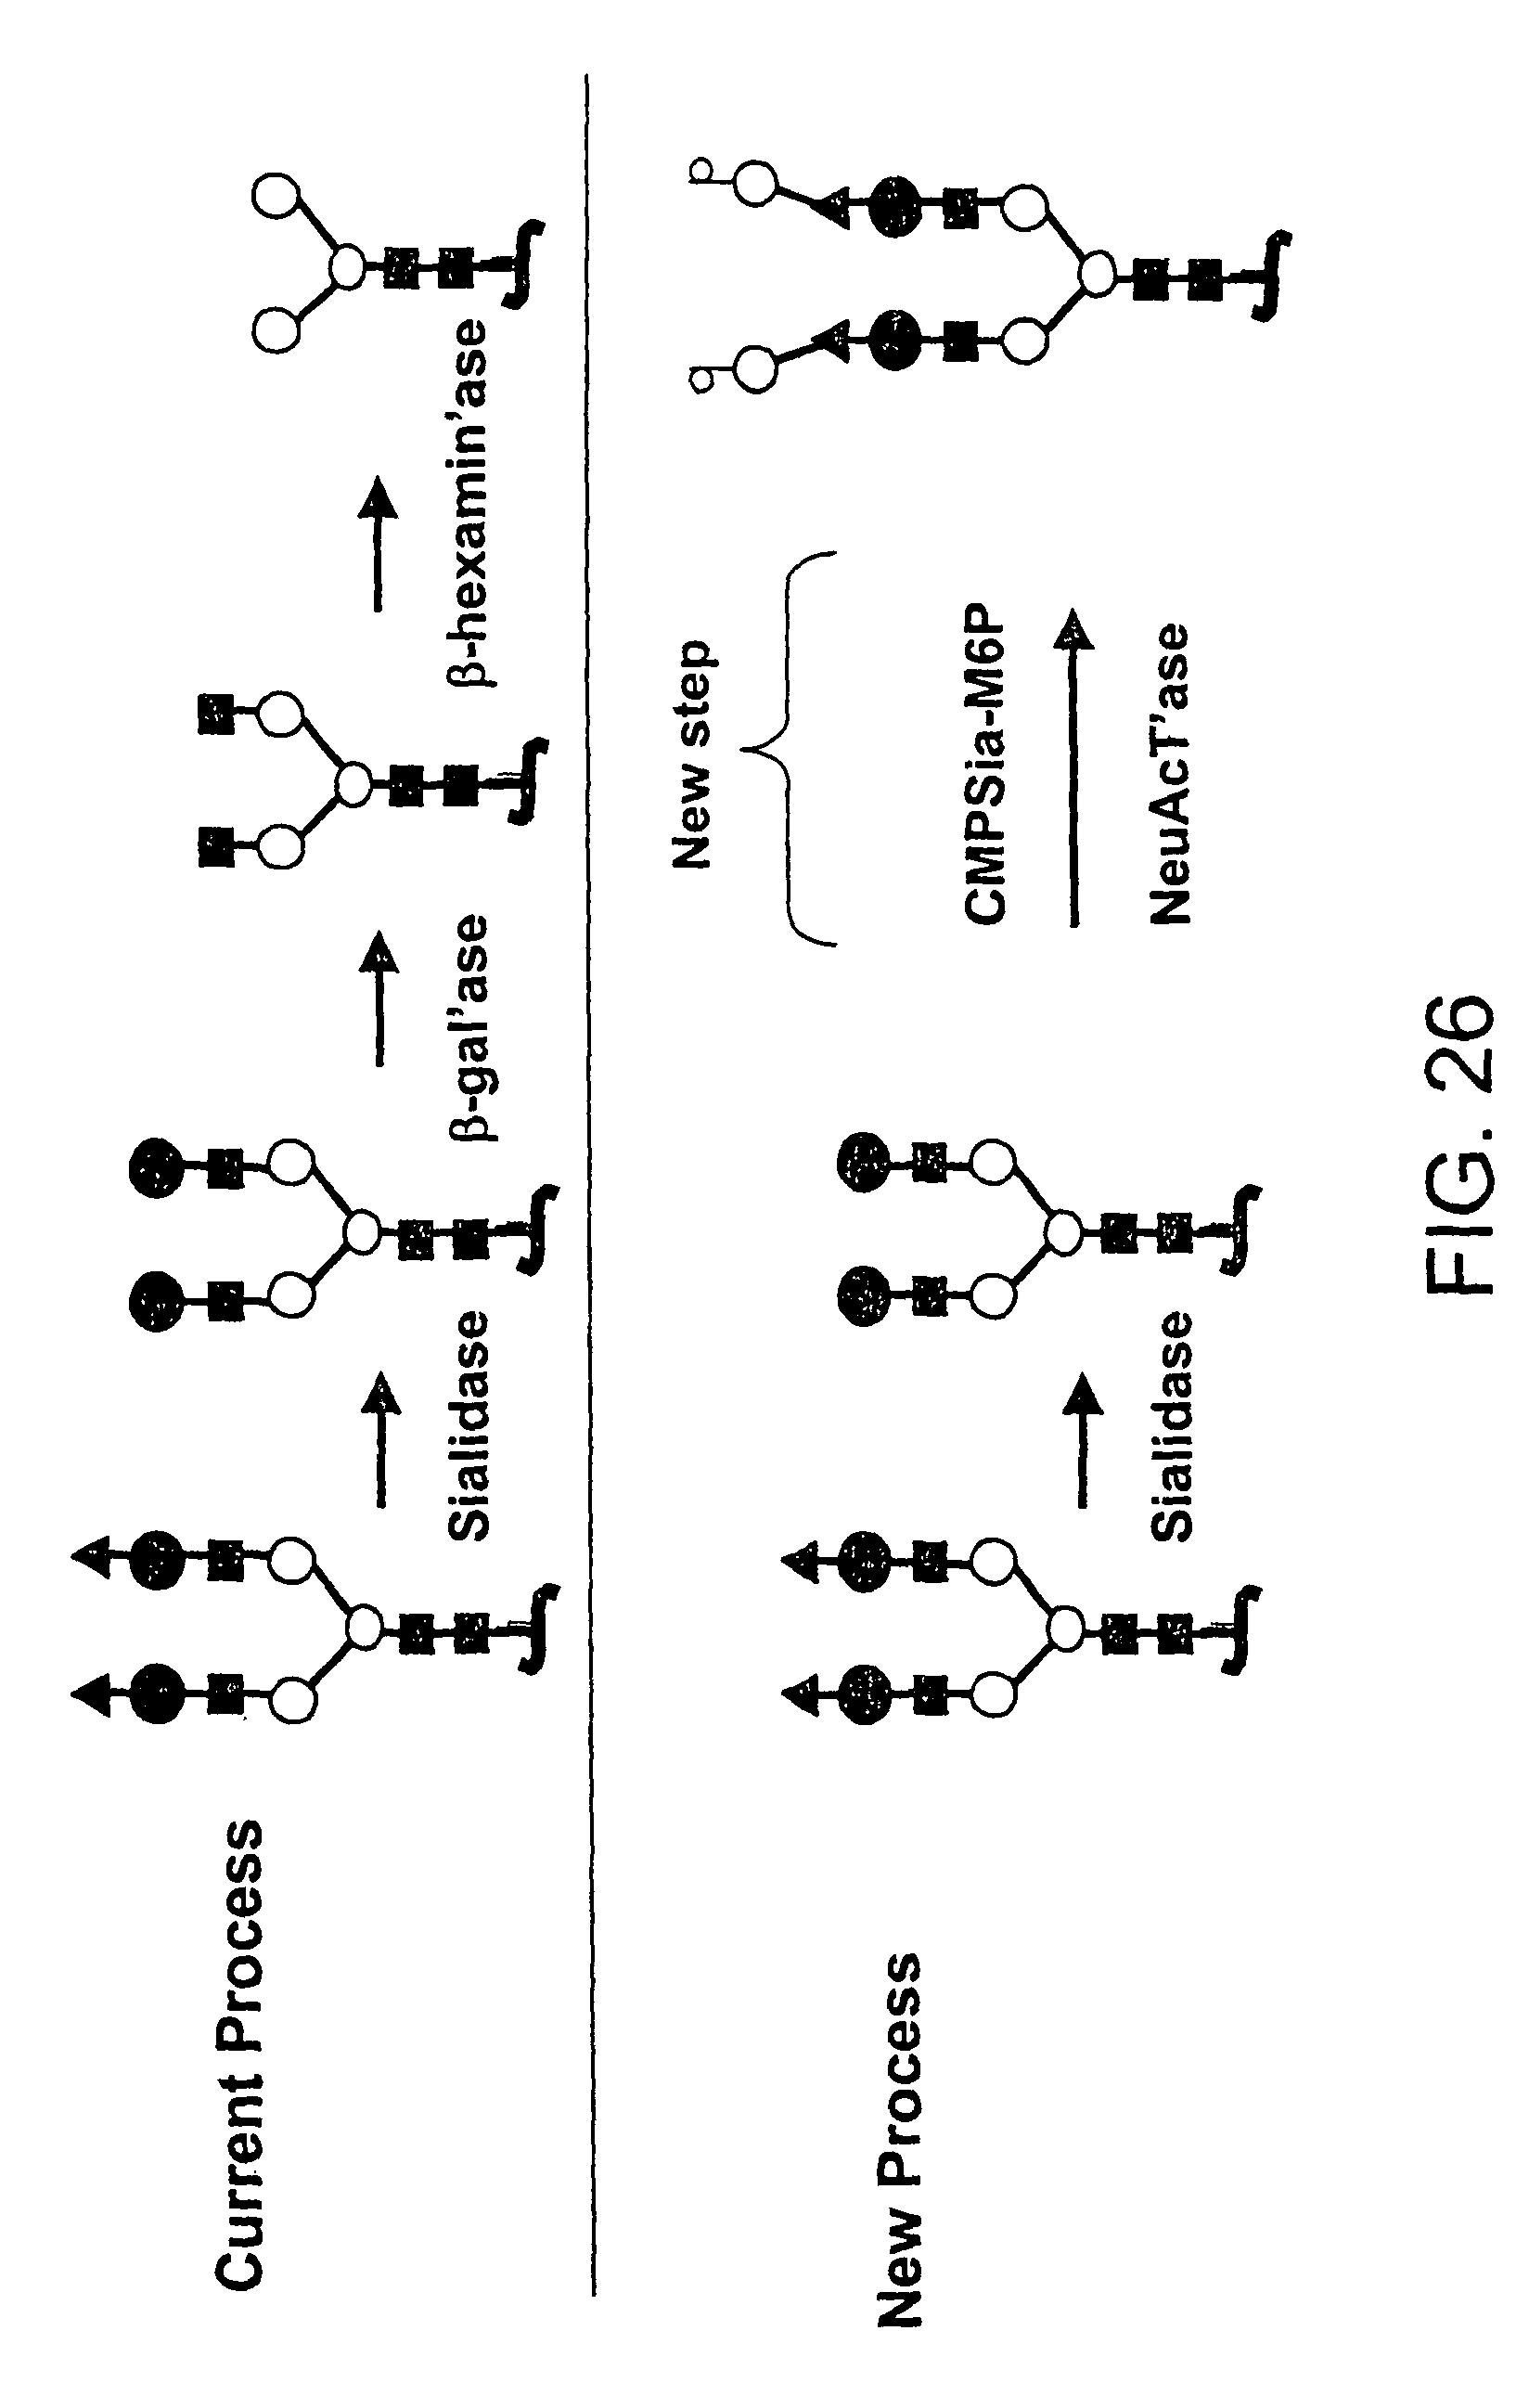 Patent US 8,716,240 B2